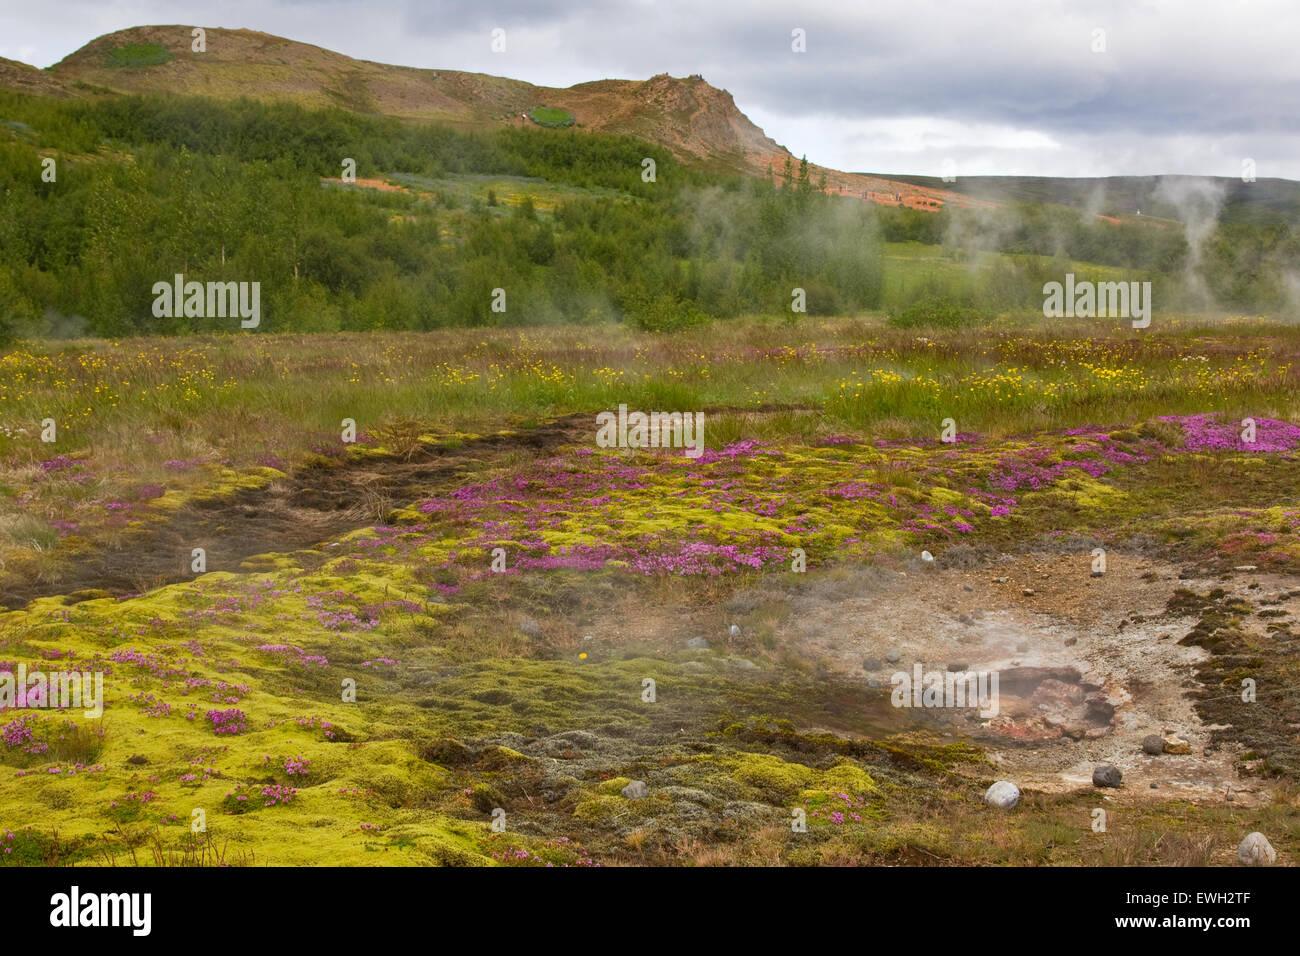 Área geotérmica en Islandia Imagen De Stock